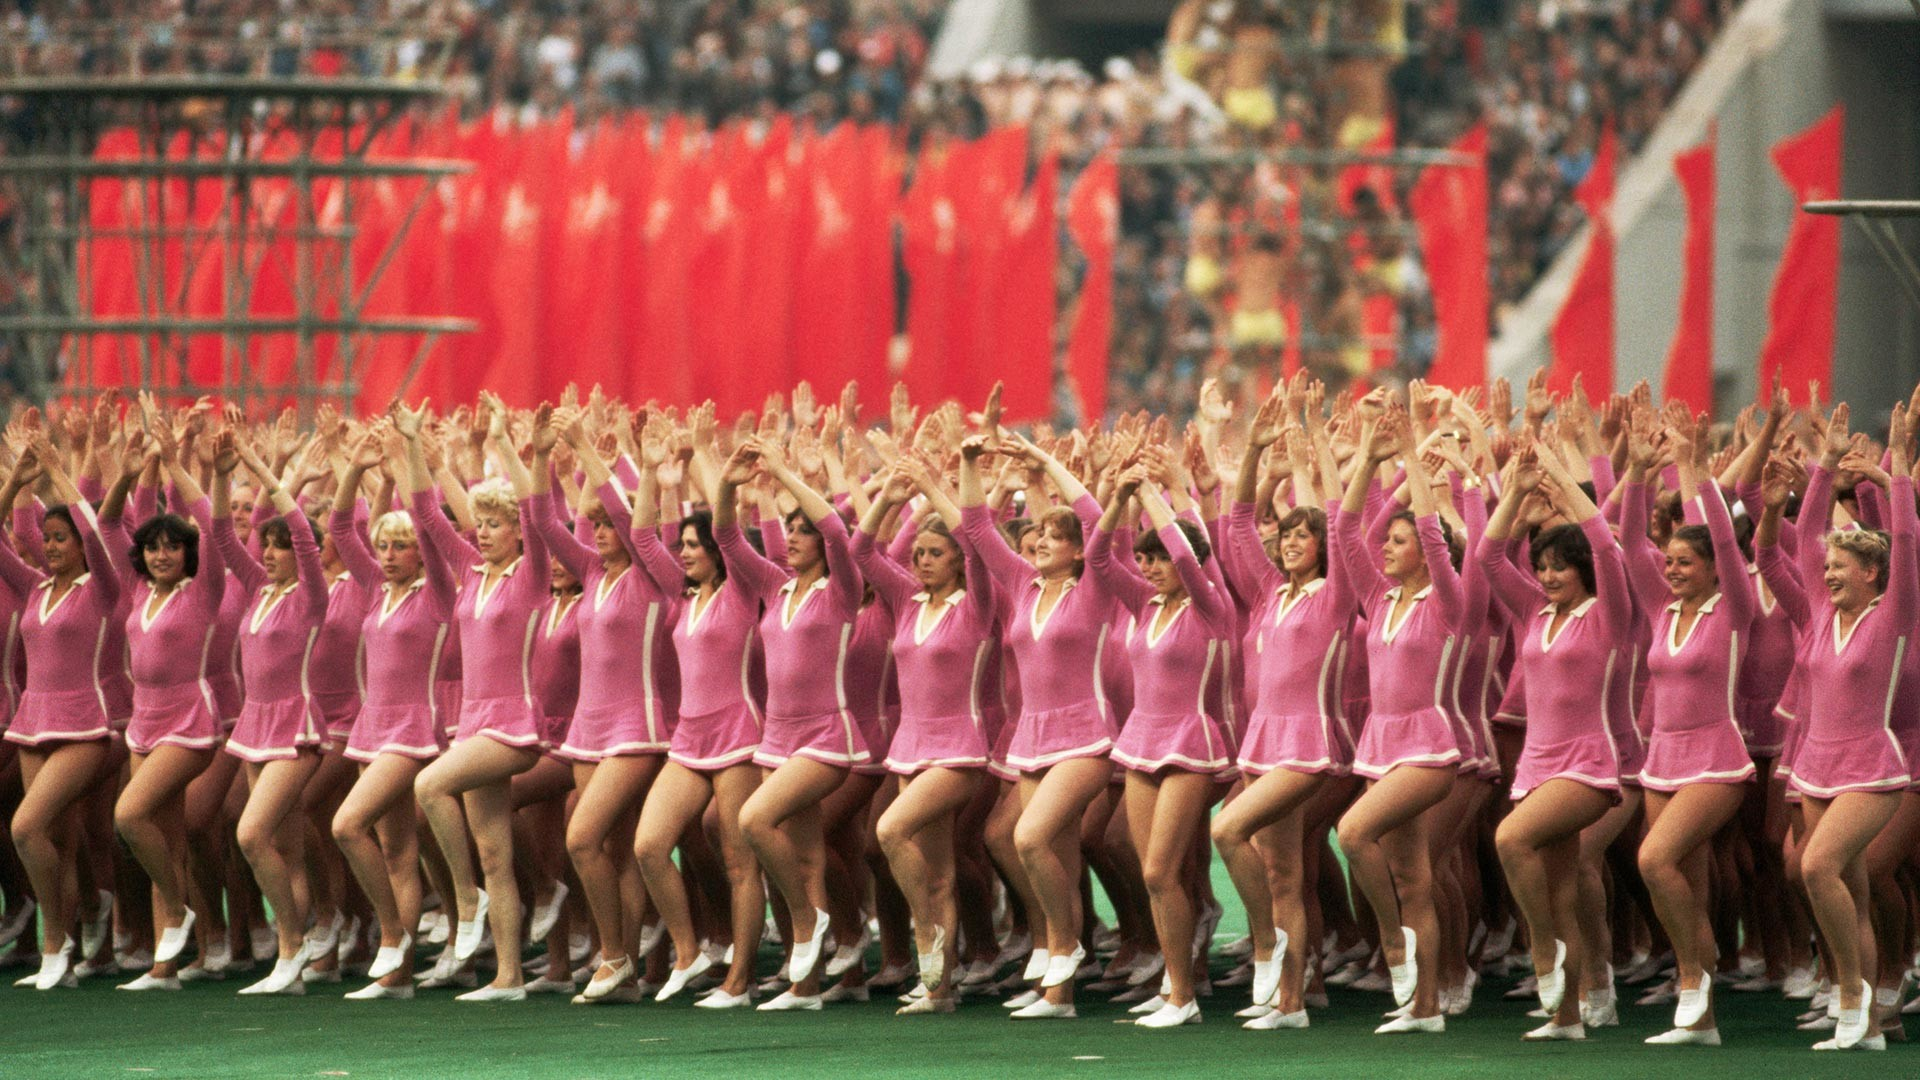 Otvoritvena slovesnost na OI leta 1980